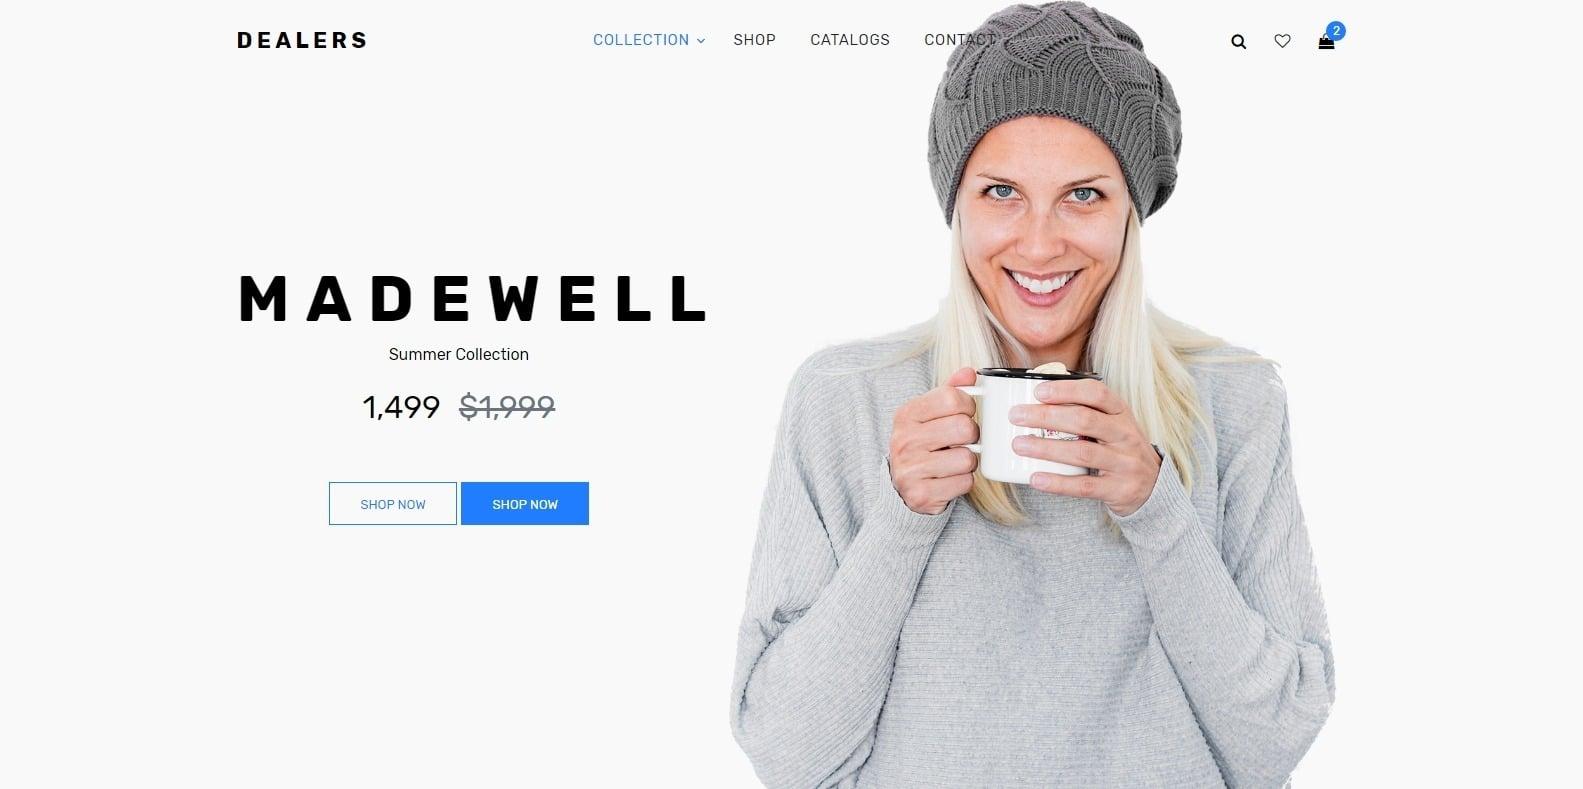 dealers-shop-website-template